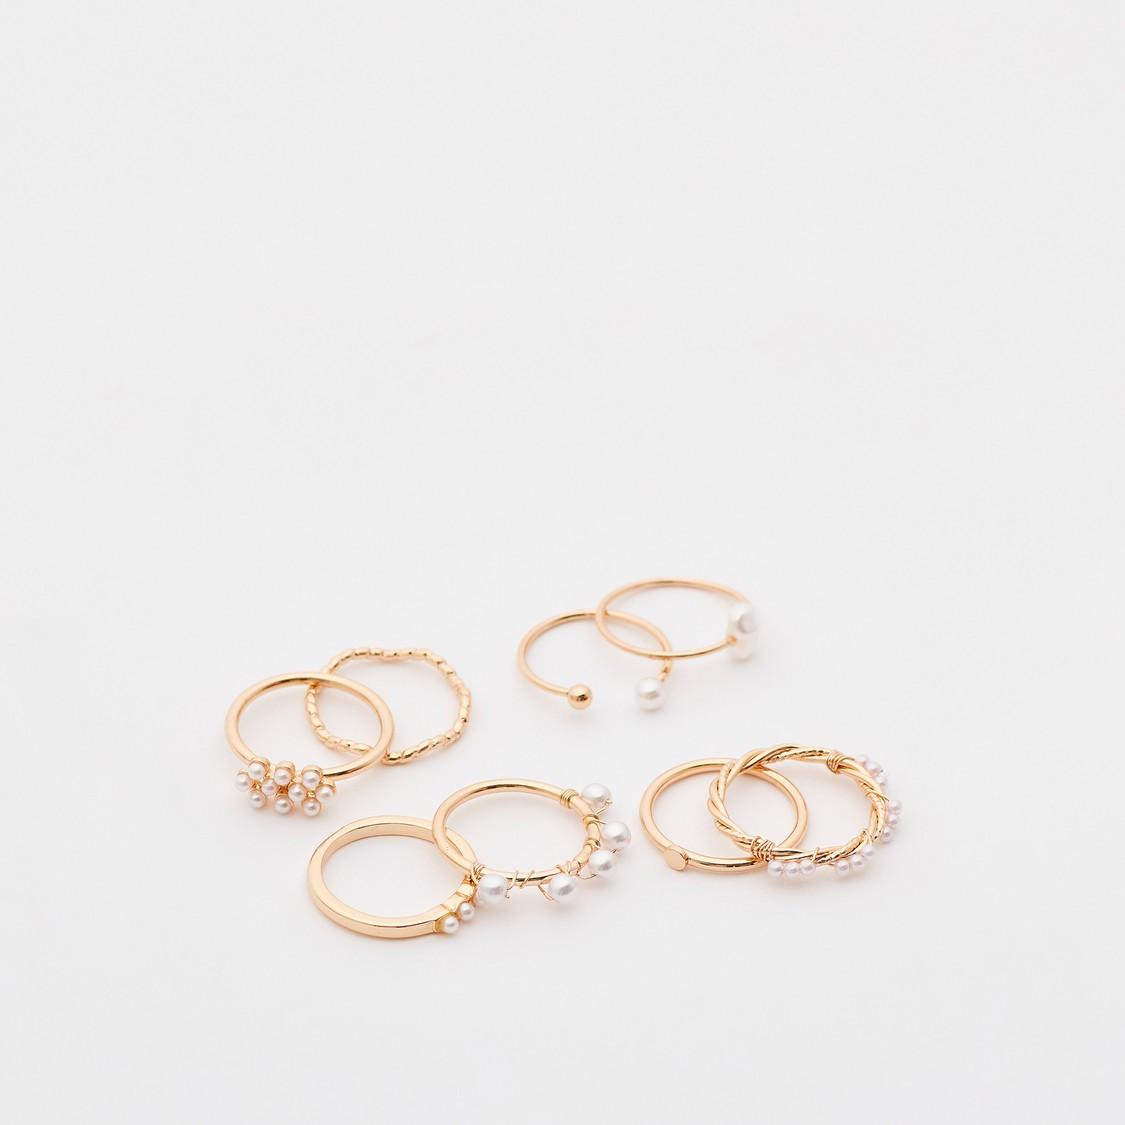 Set of 8 - Assorted Finger Rings